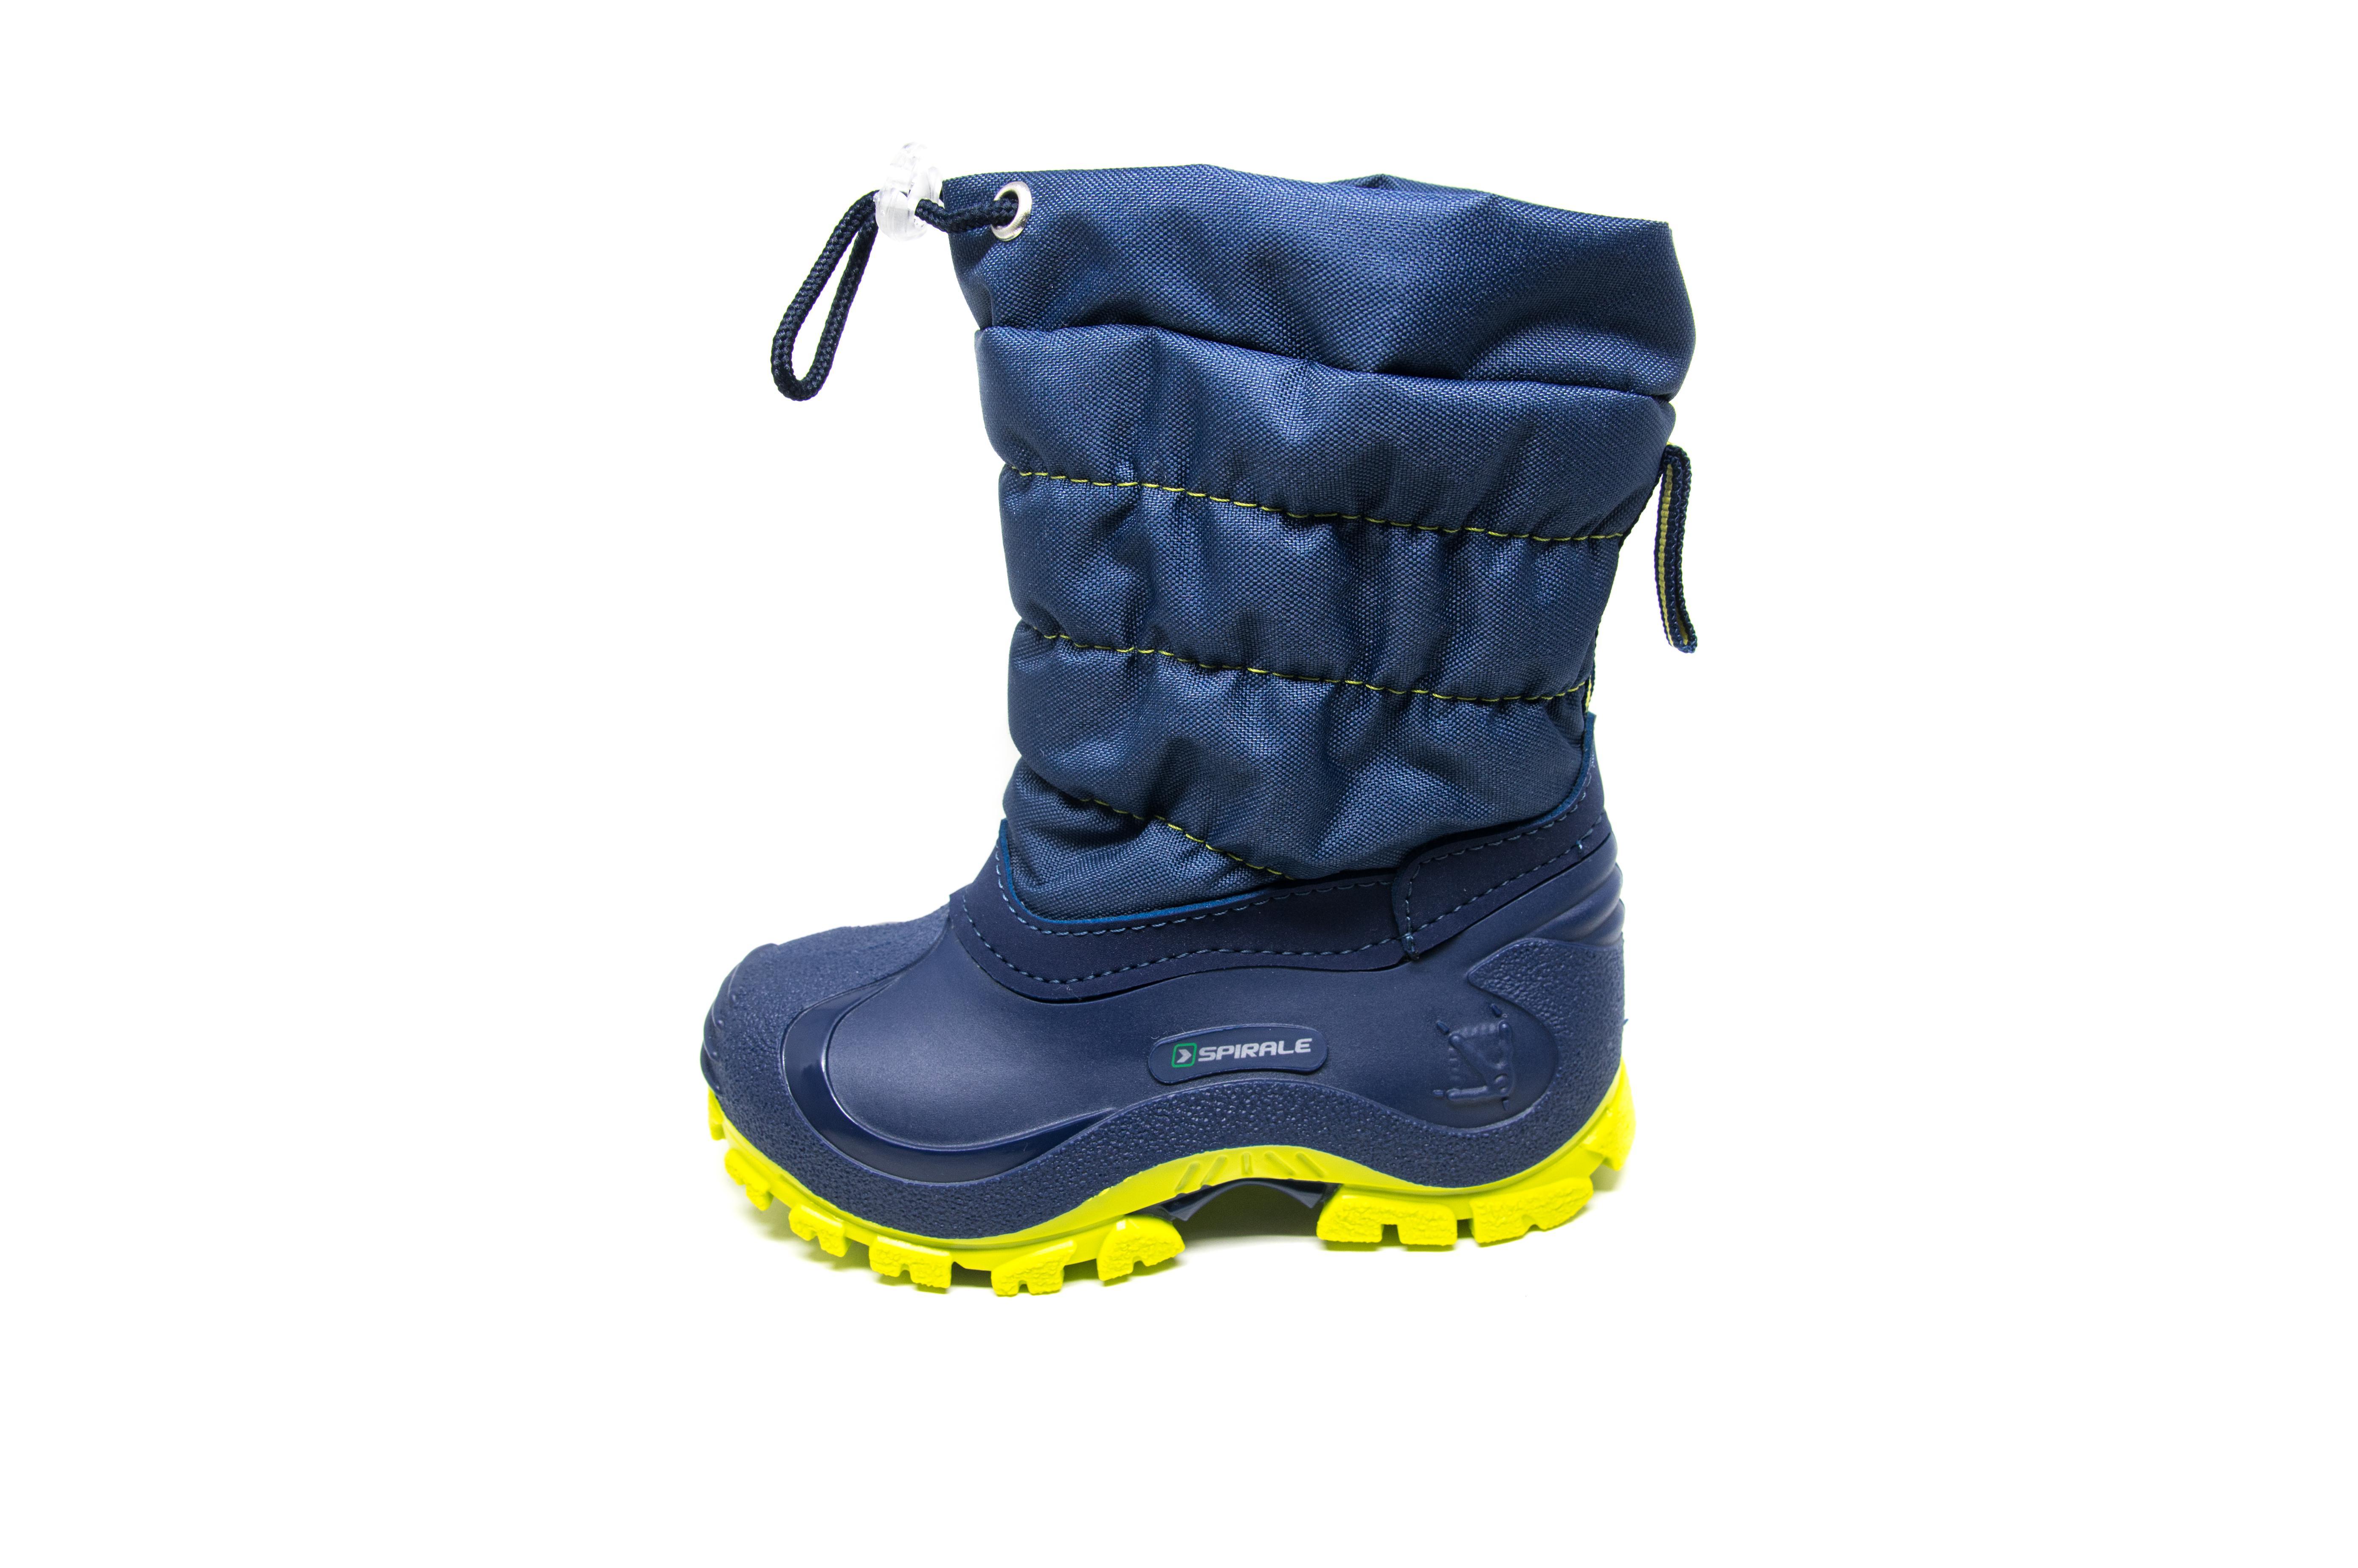 343035427ea Γαλότσα Spirale 78129 μπλε | Patousaki Παιδικά Παπούτσια